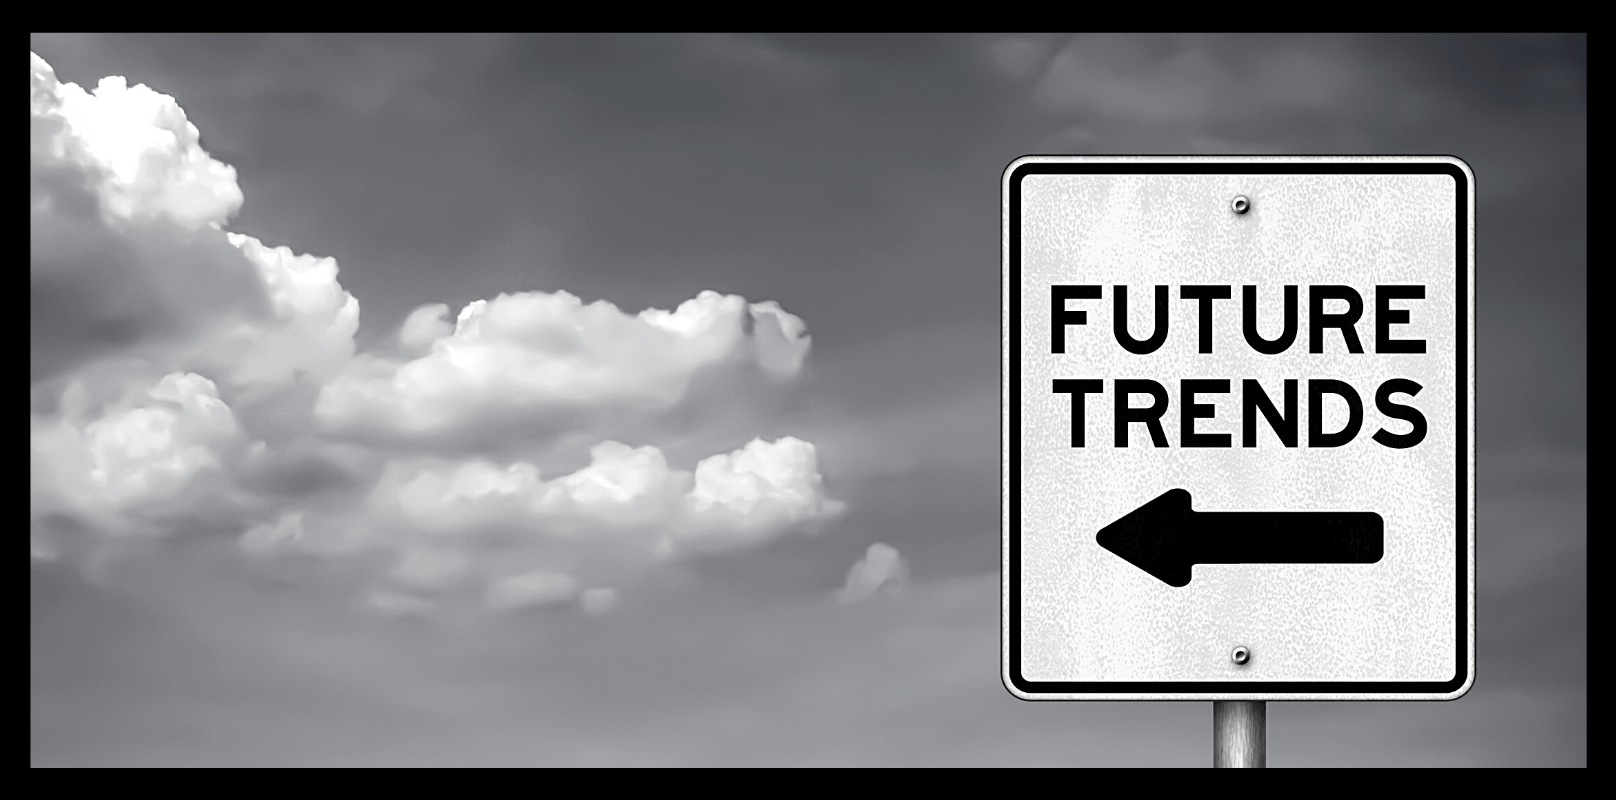 Gartner's top technology trends